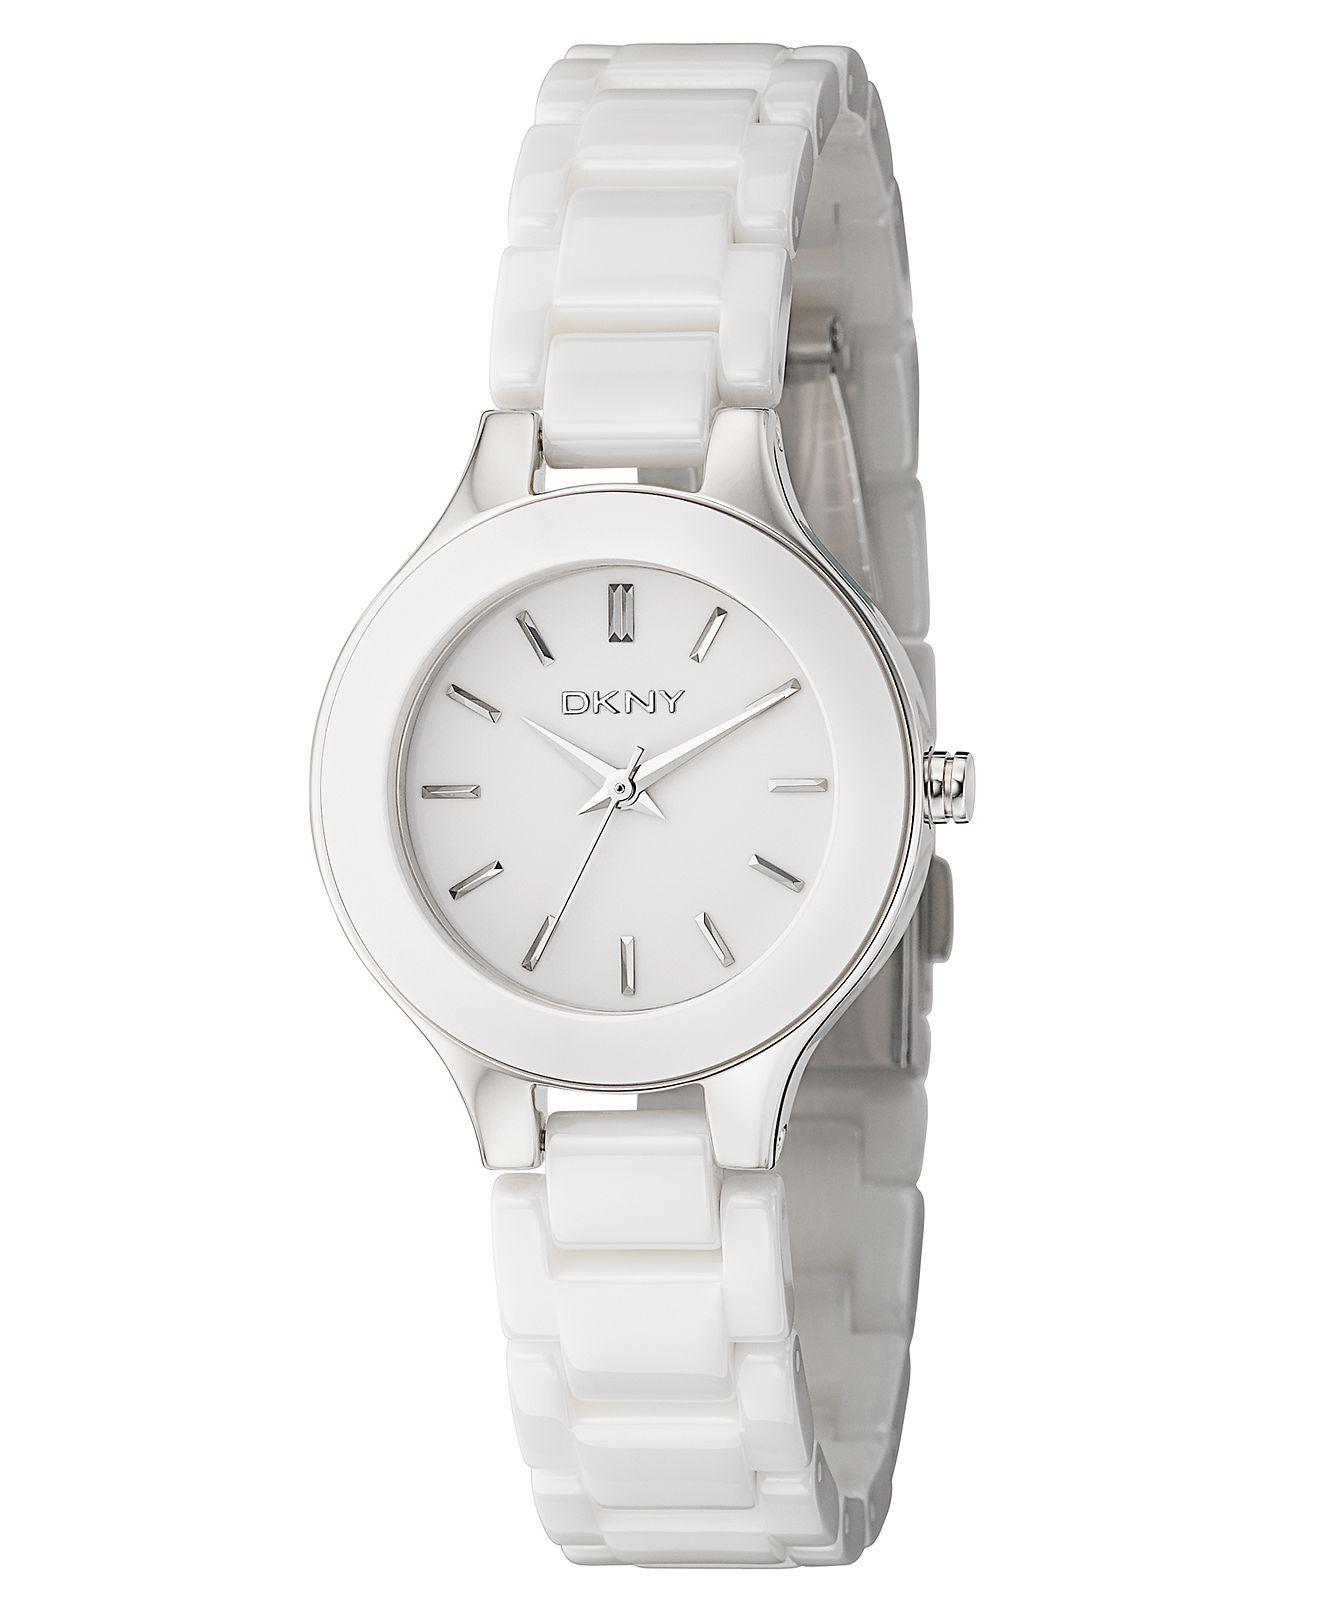 Dkny Watch Women S White Ceramic Bracelet Ny4886 Women S Watches Jewelry Watches Macy S Womens Watches Dkny Watch Bracelet Watch